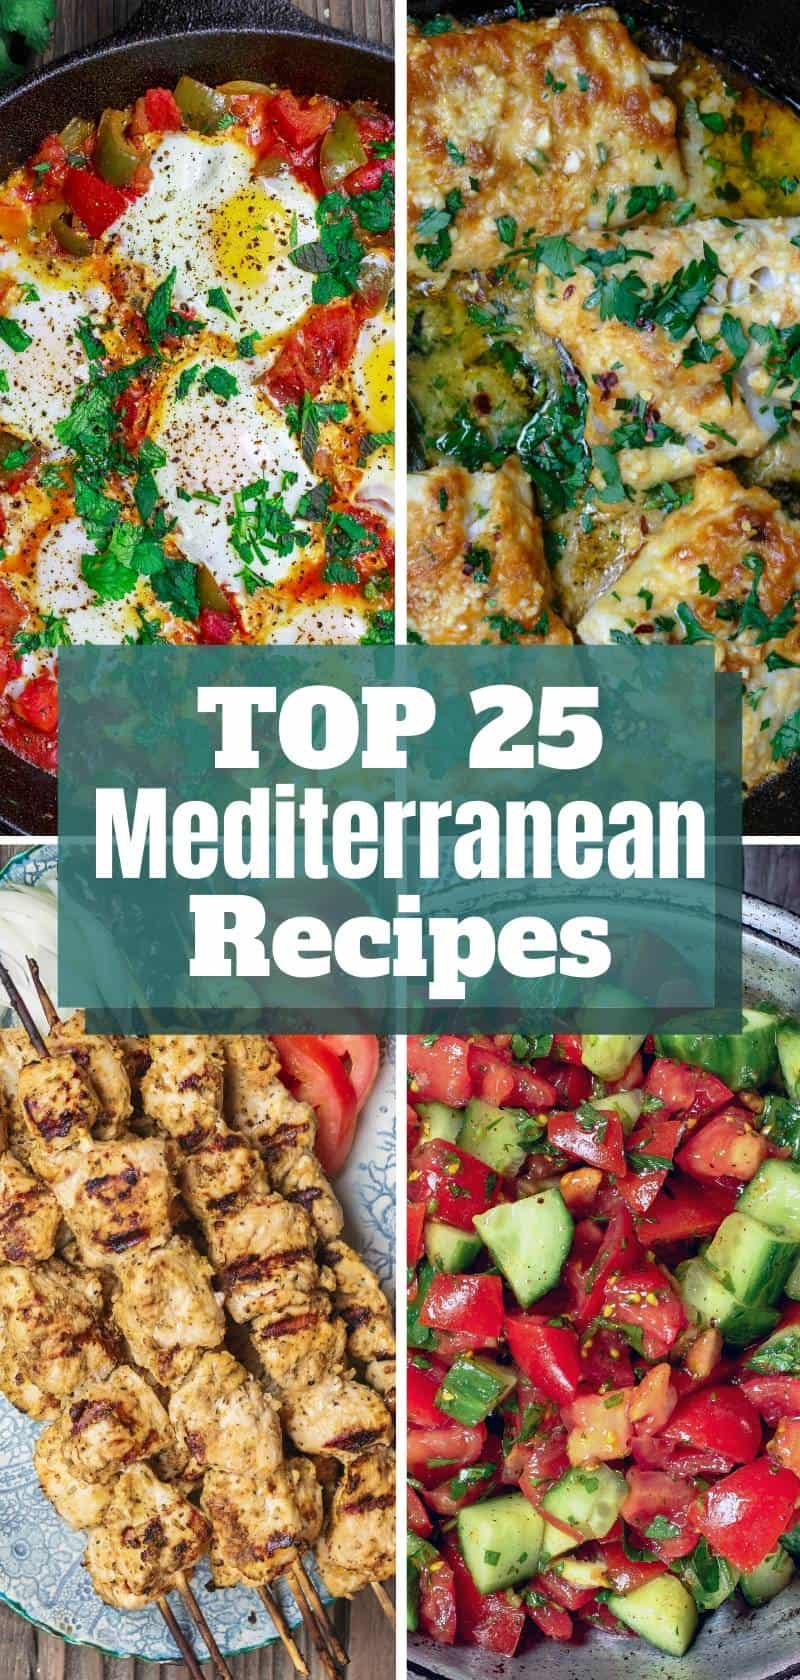 top 25 Mediterranean recipes collage of photos